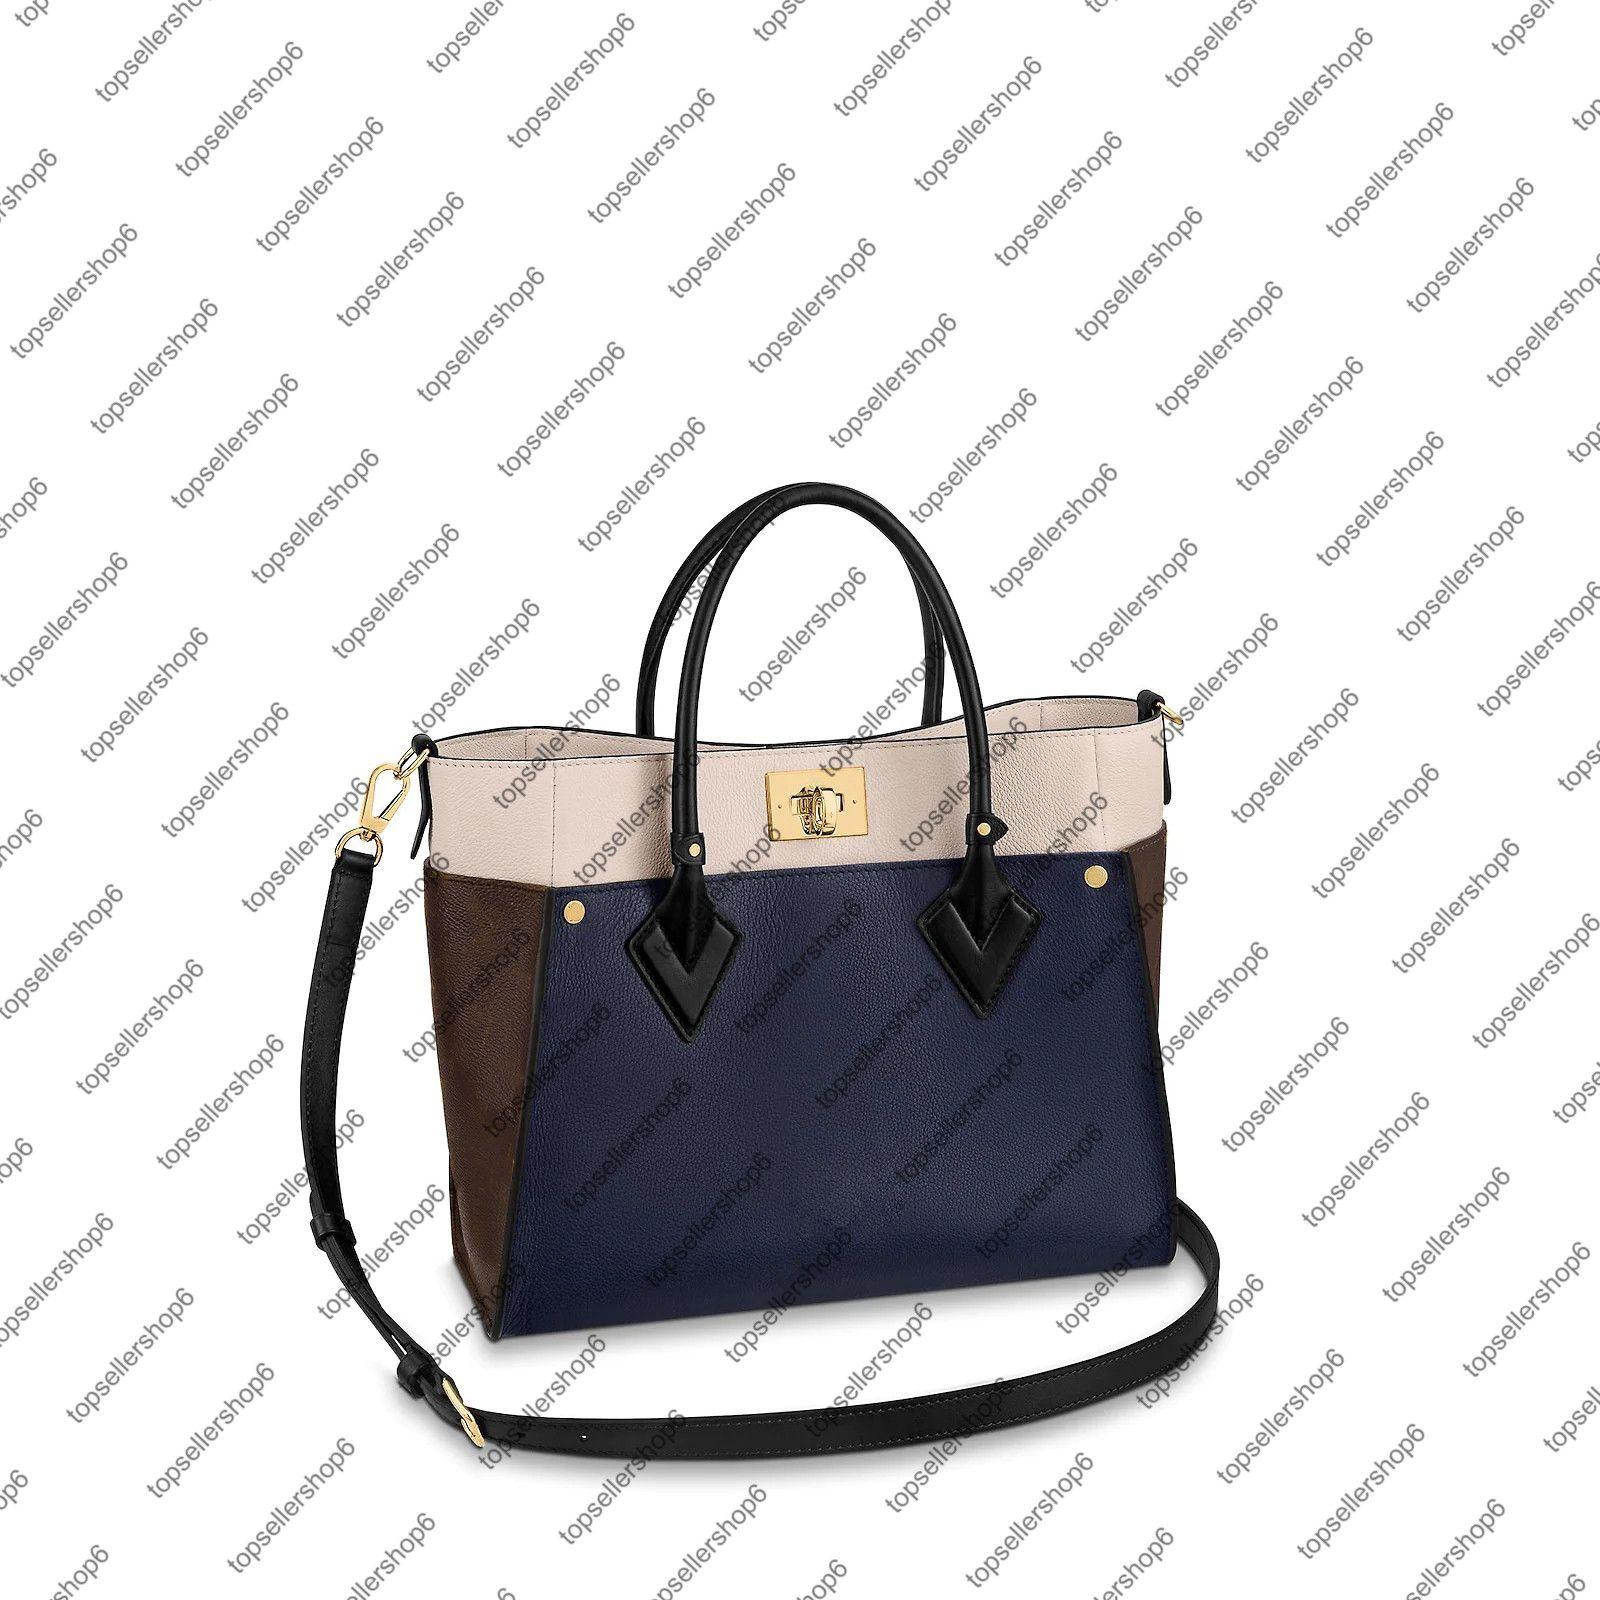 M55933 على جانبي حمل حقيبة أنيقة المرأة جلد طبيعي قماش عبر الجسم حقيبة يد محفظة التسوق حقيبة الكتف